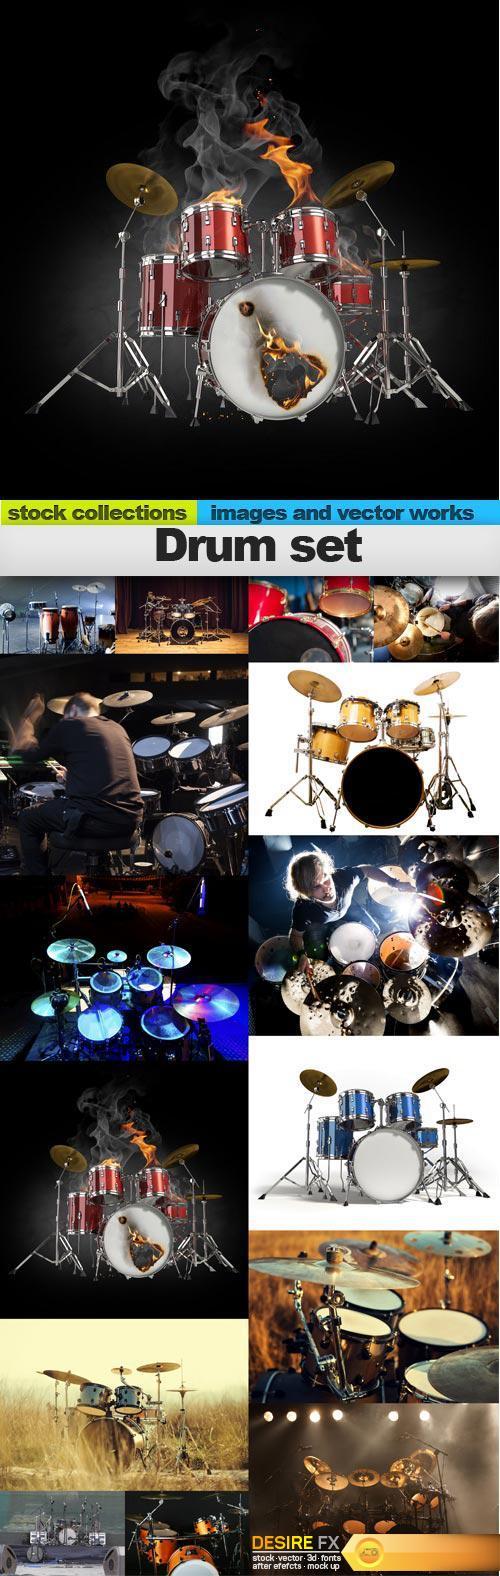 Drum set, 15 x UHQ JPEG  http://www.desirefx.me/drum-set-15-x-uhq-jpeg/